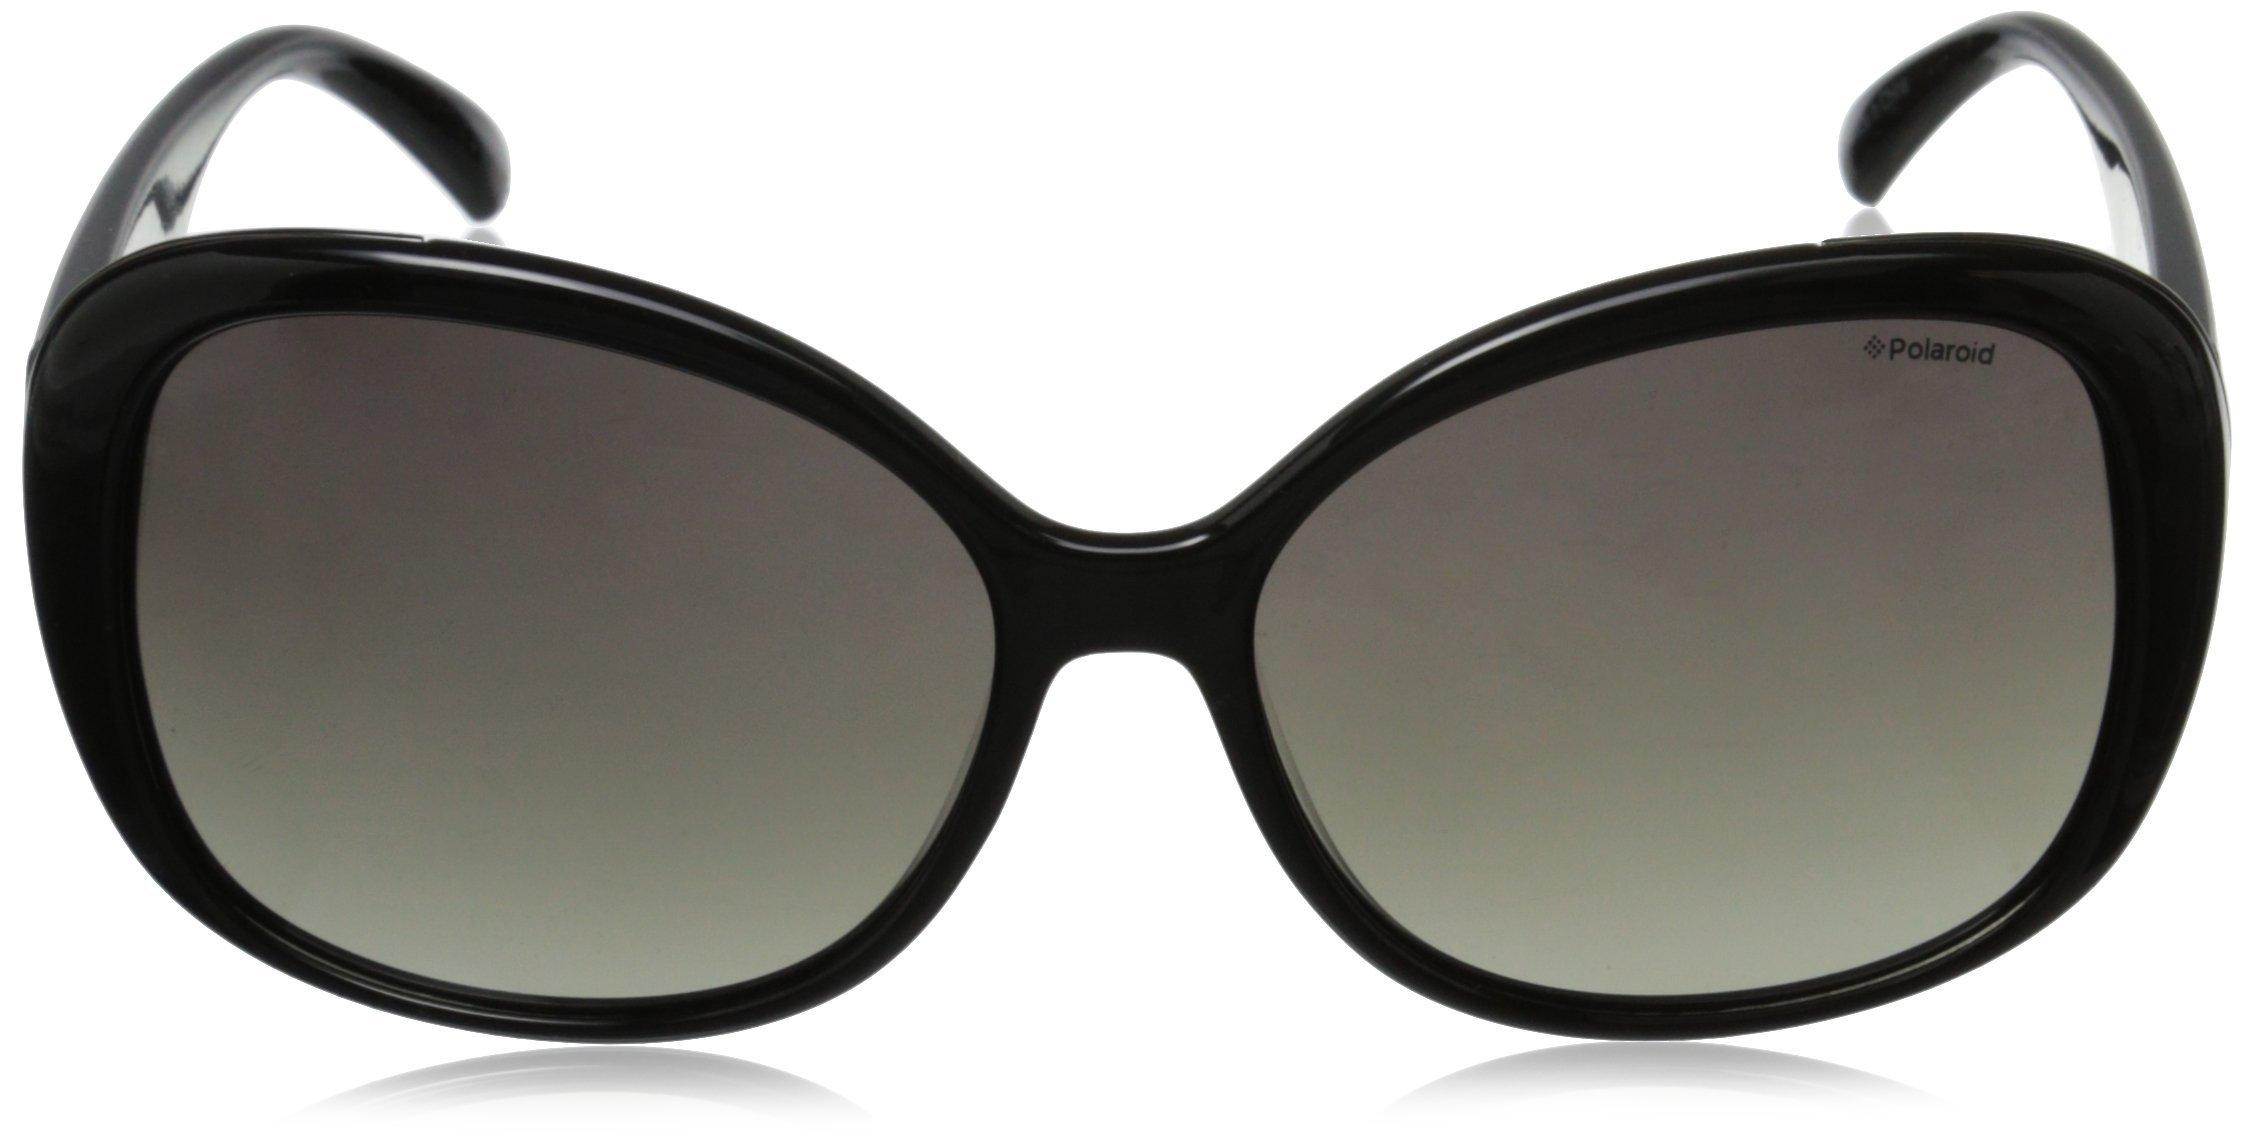 e833514fb582 Polaroid Sunglasses Women s Pld4023s Polarized Oval Sunglasses ...